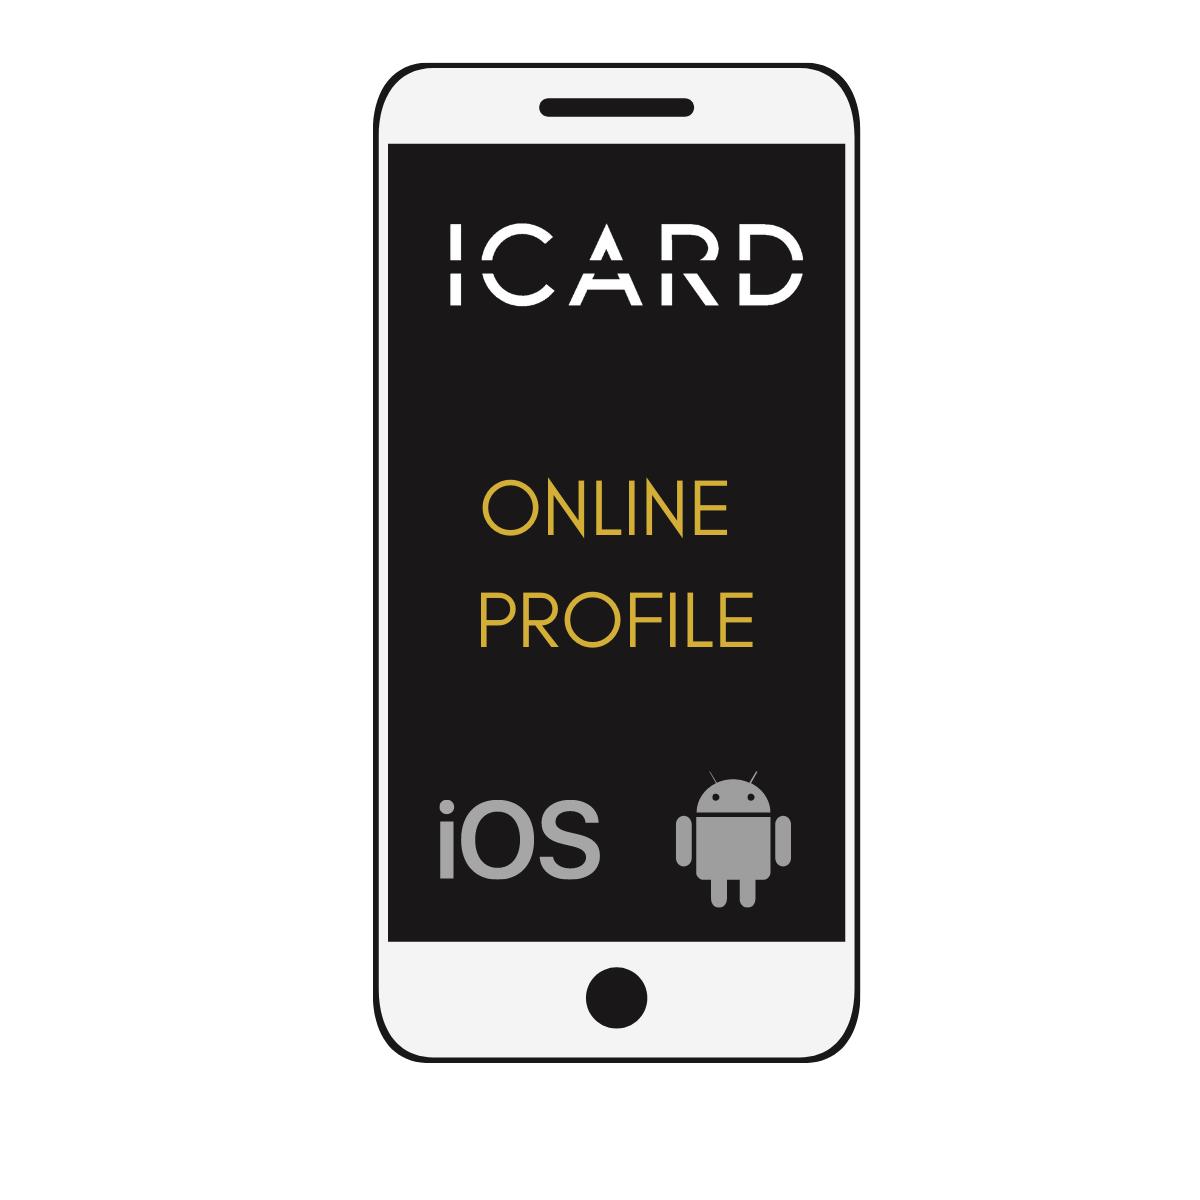 ICARD Online Profile